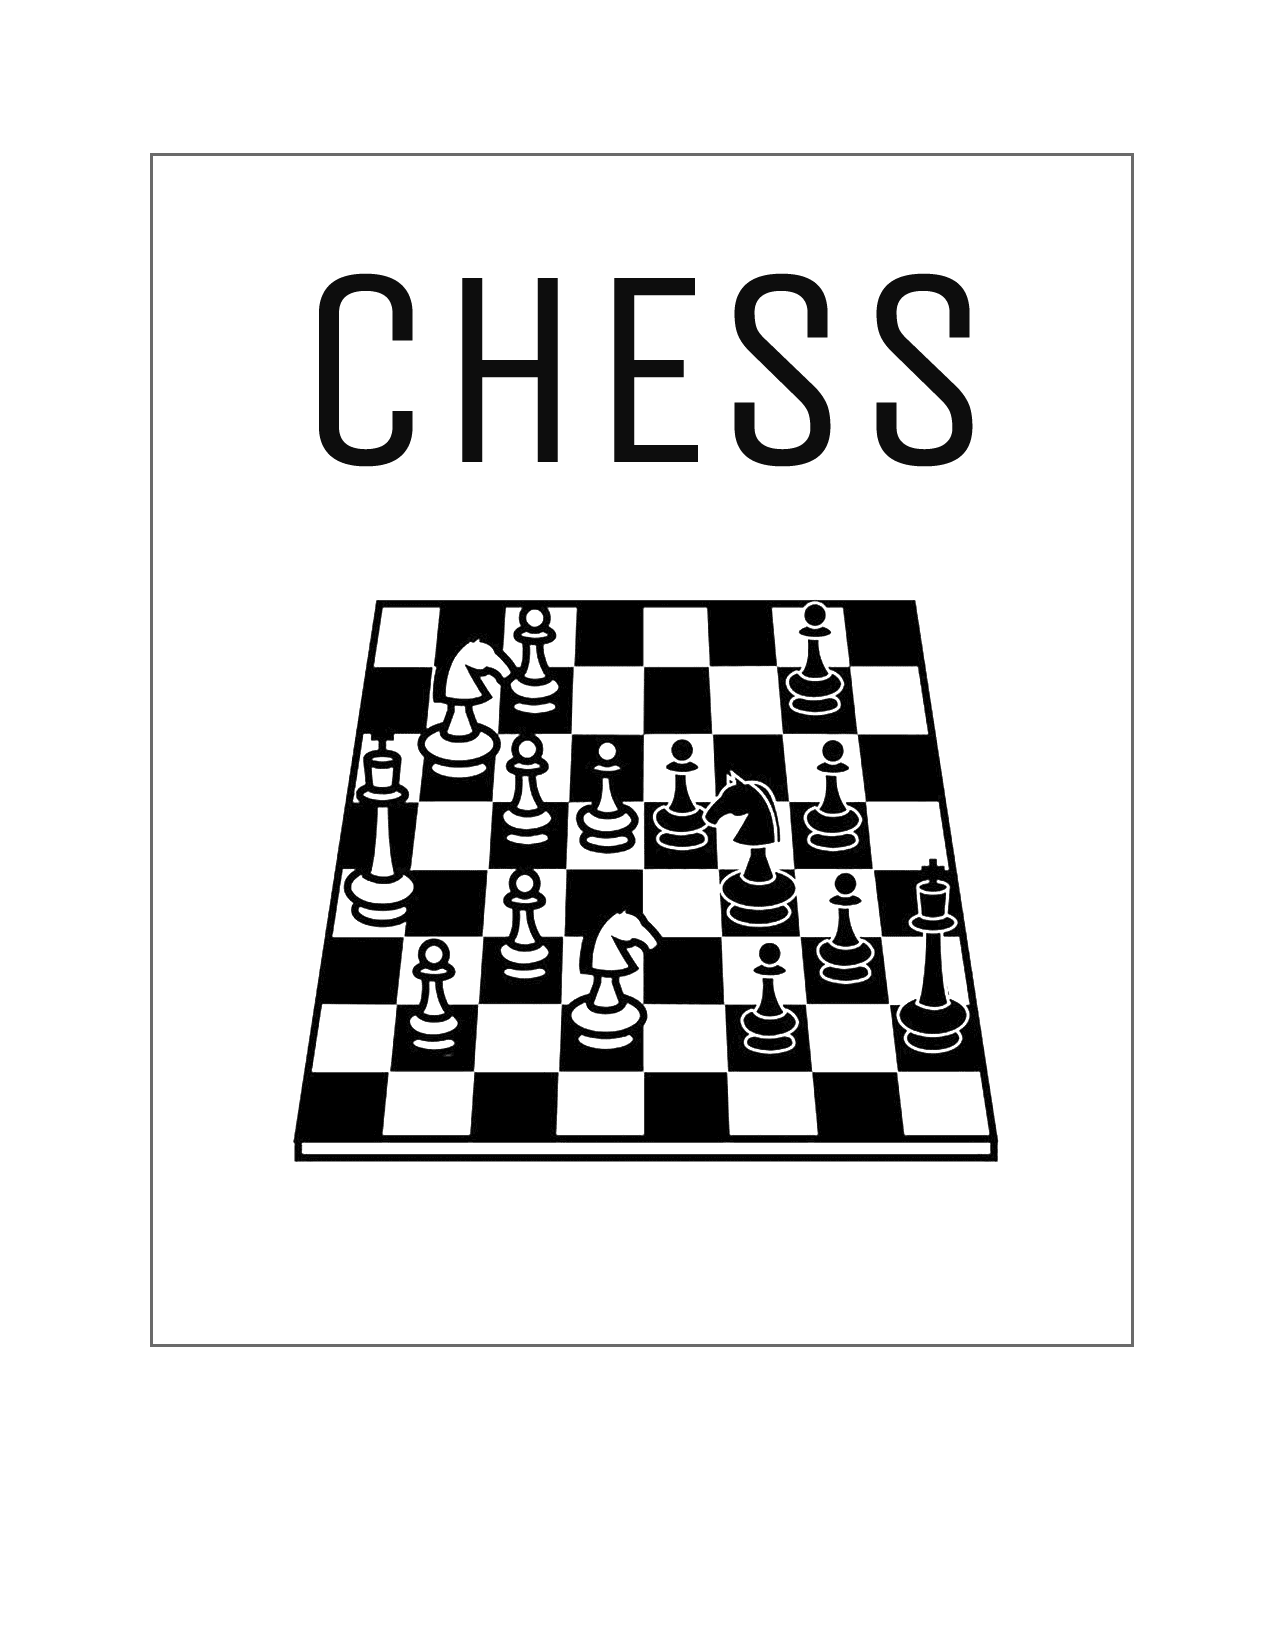 Chess Board Printable Sheet